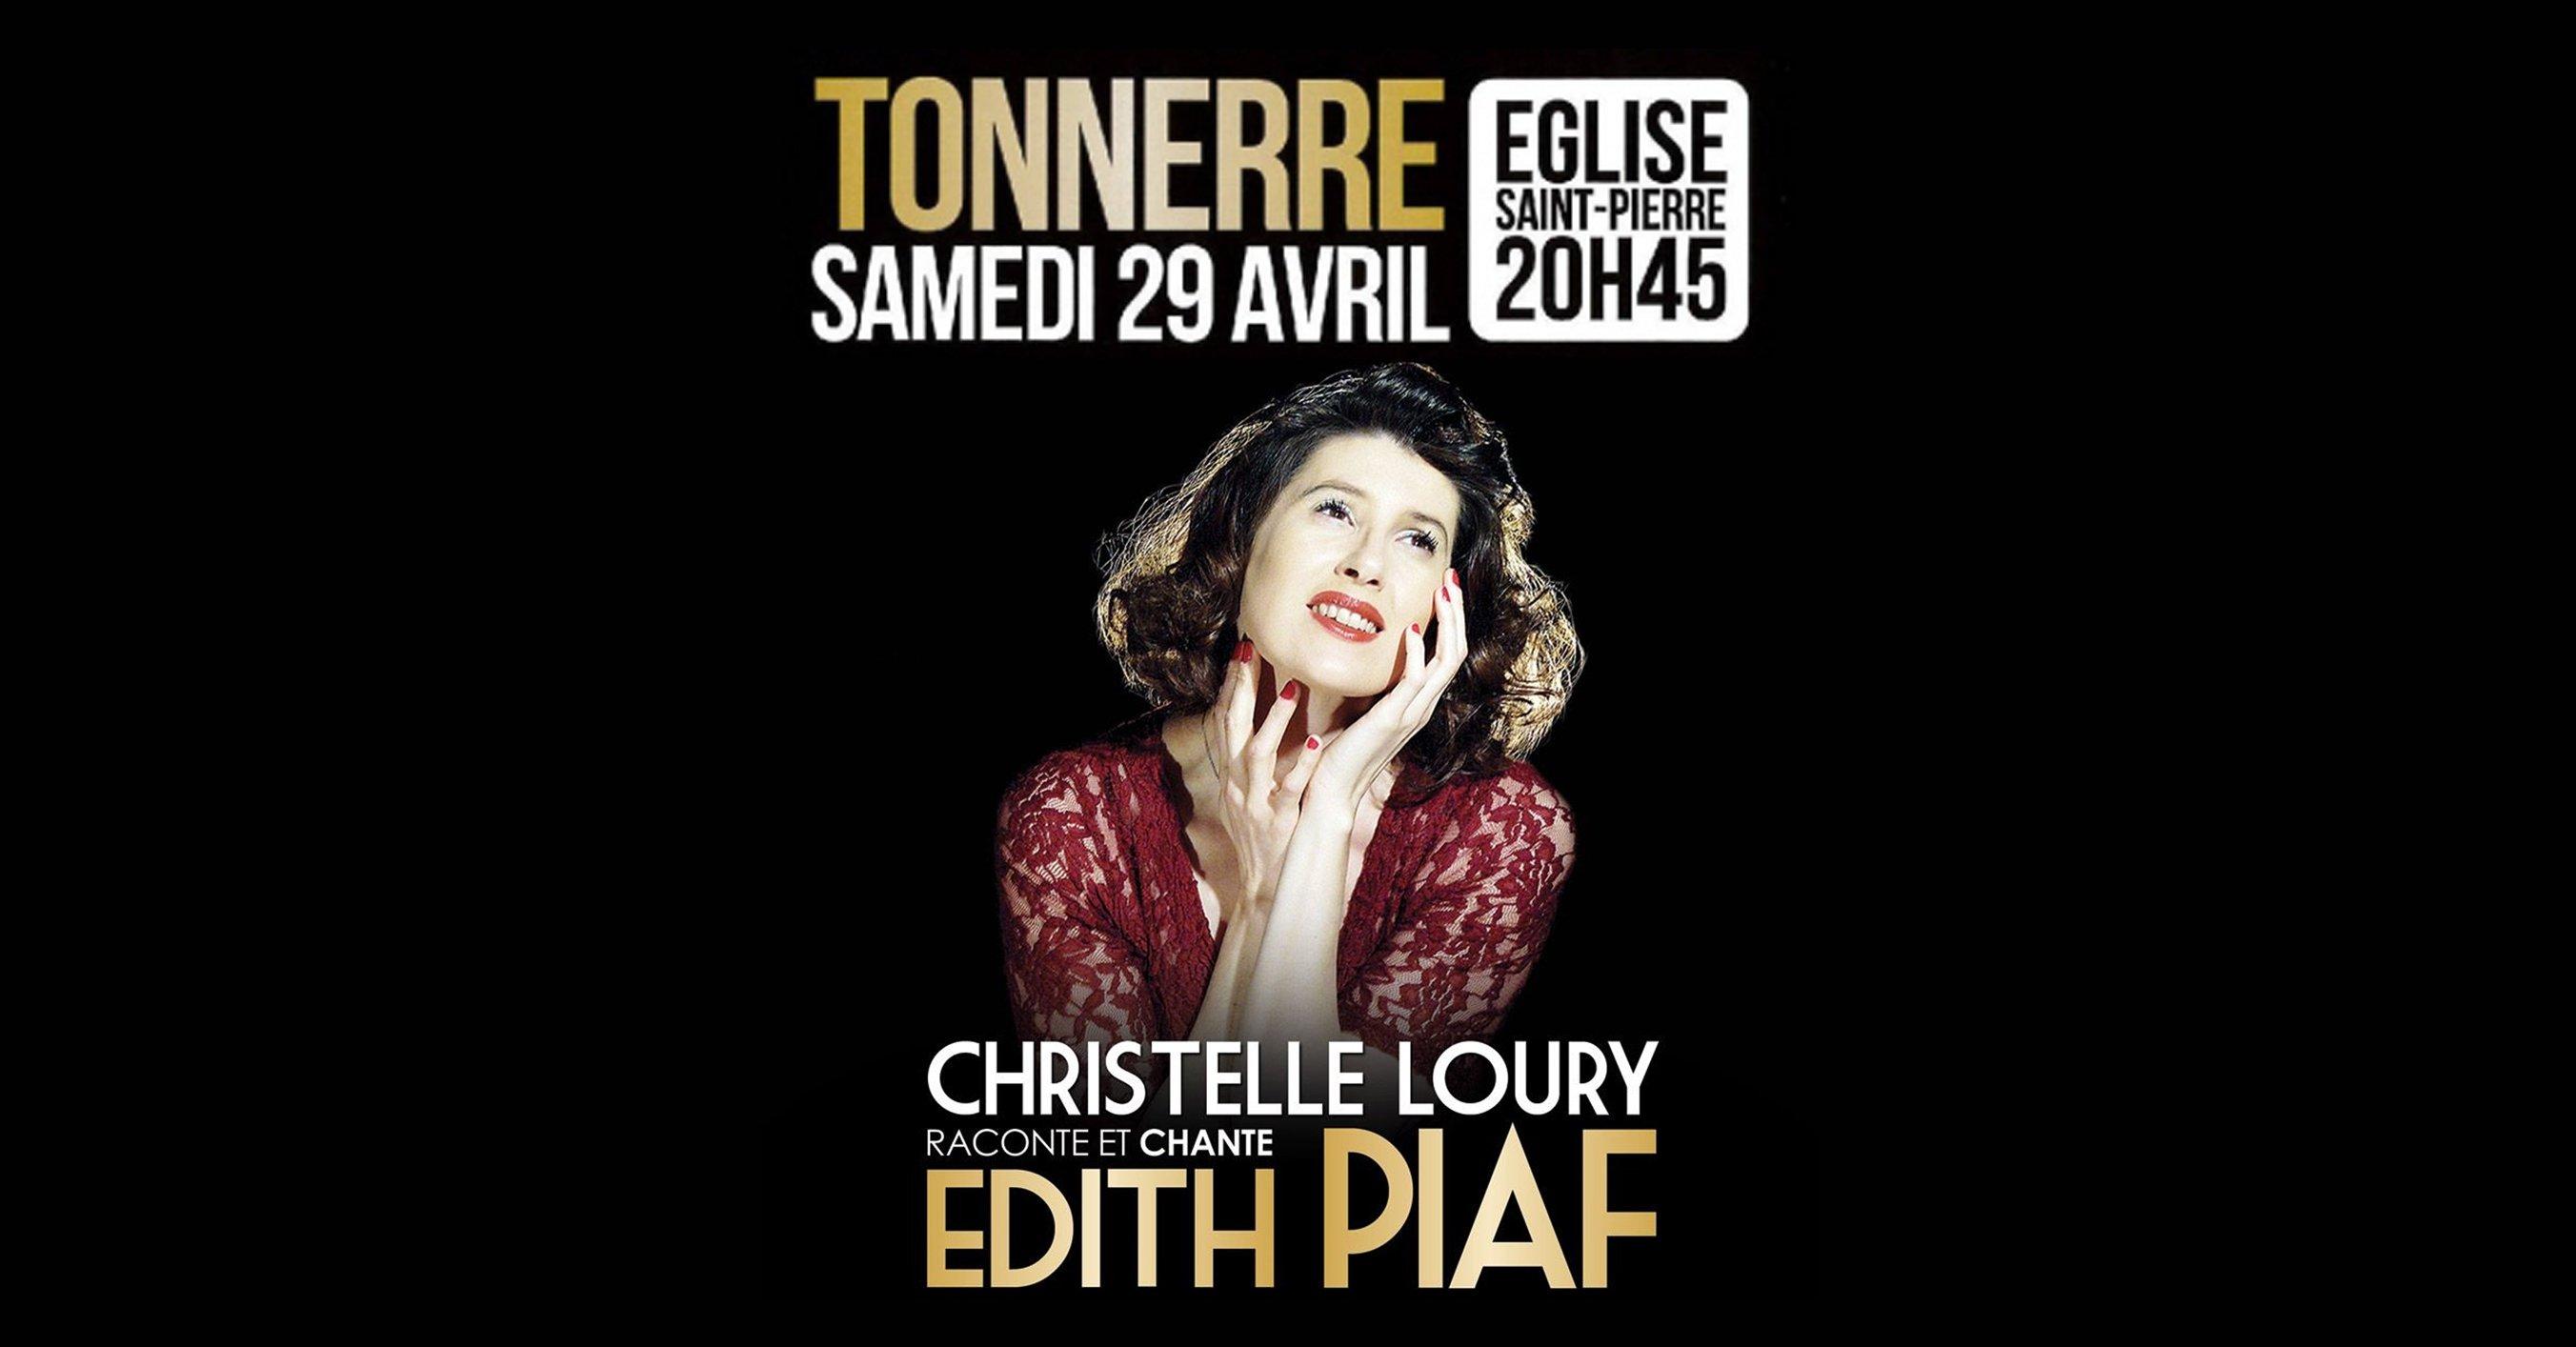 Concert Christelle Loury